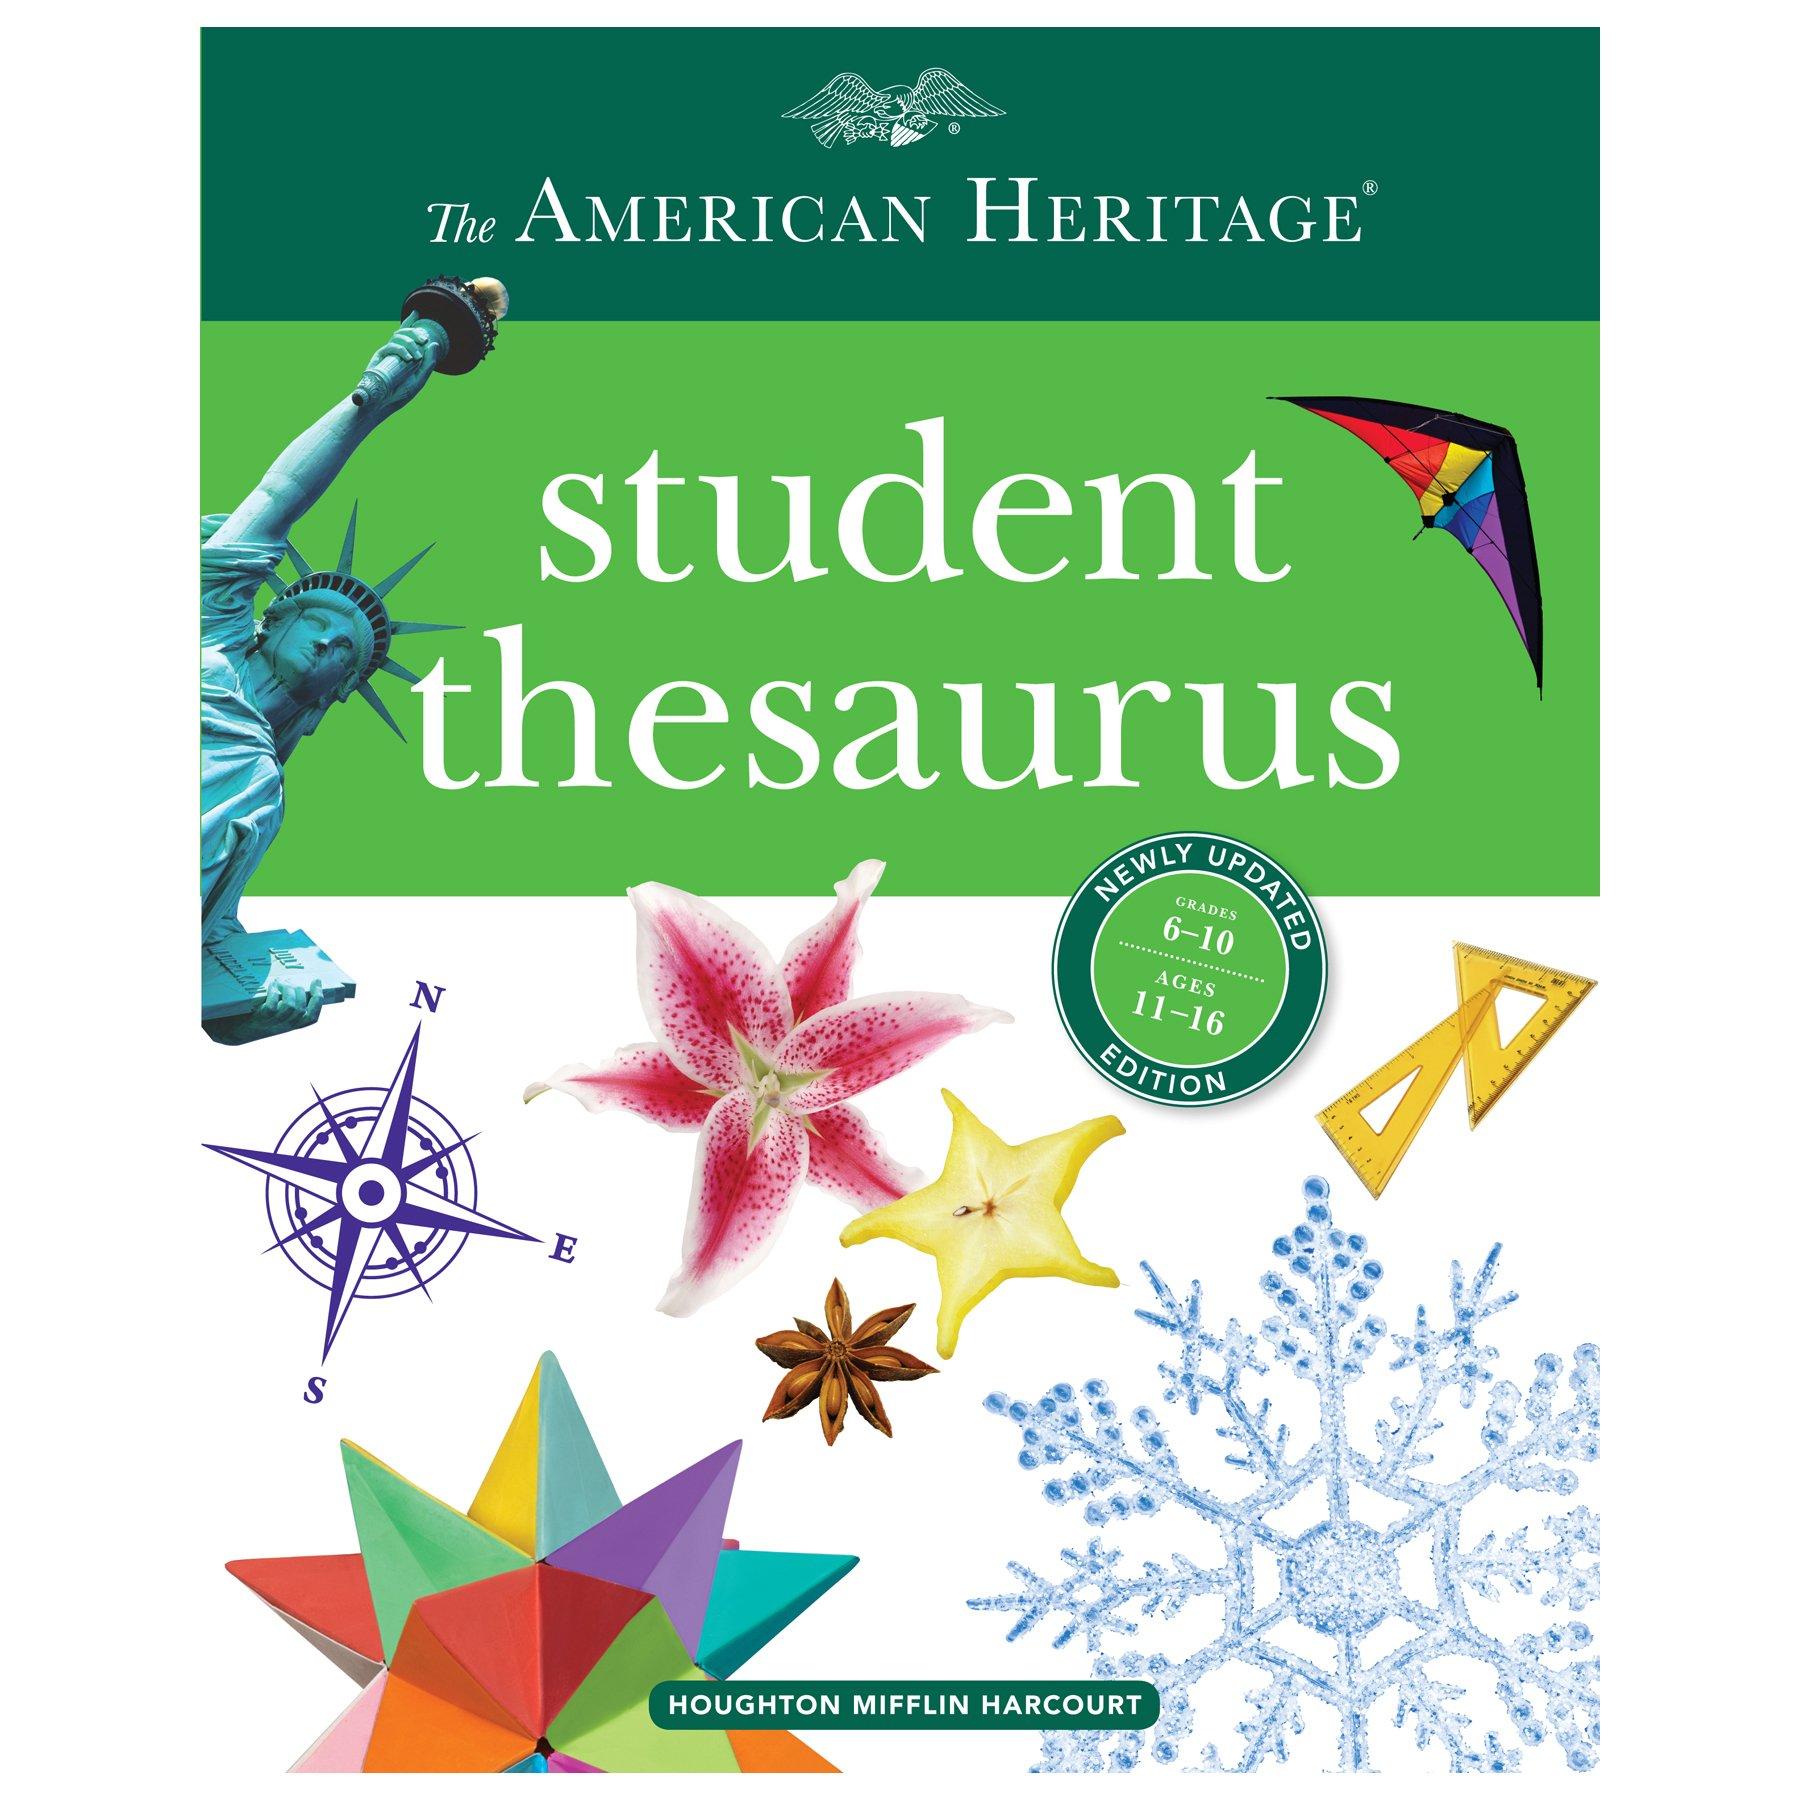 The american heritage student thesaurus paul hellweg joyce lebaron the american heritage student thesaurus paul hellweg joyce lebaron susannah lebaron 0046442016025 amazon books m4hsunfo